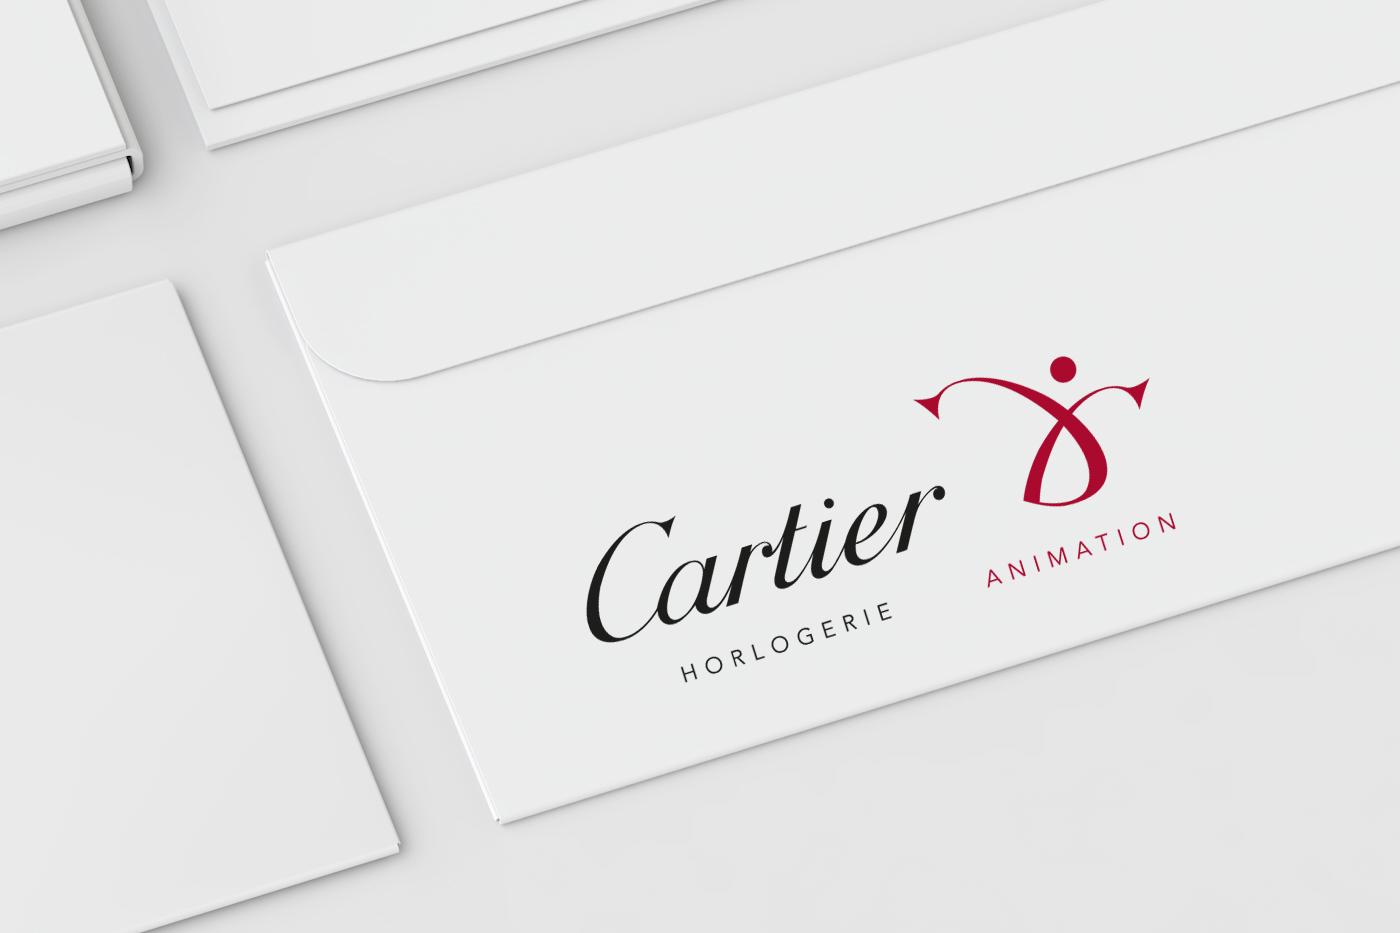 siteAB_logo Cartier